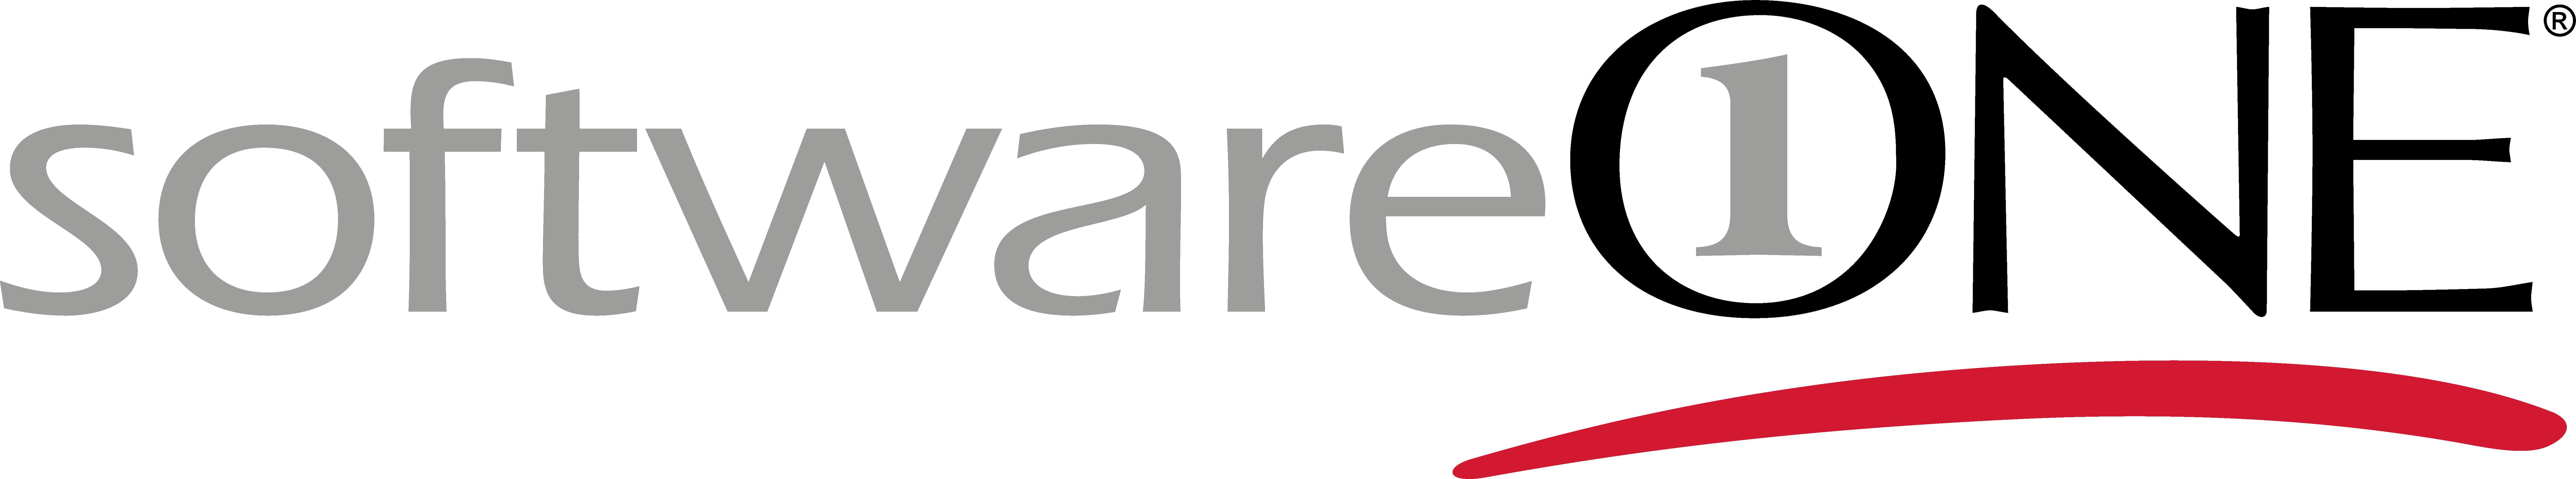 SoftwareONE Logo